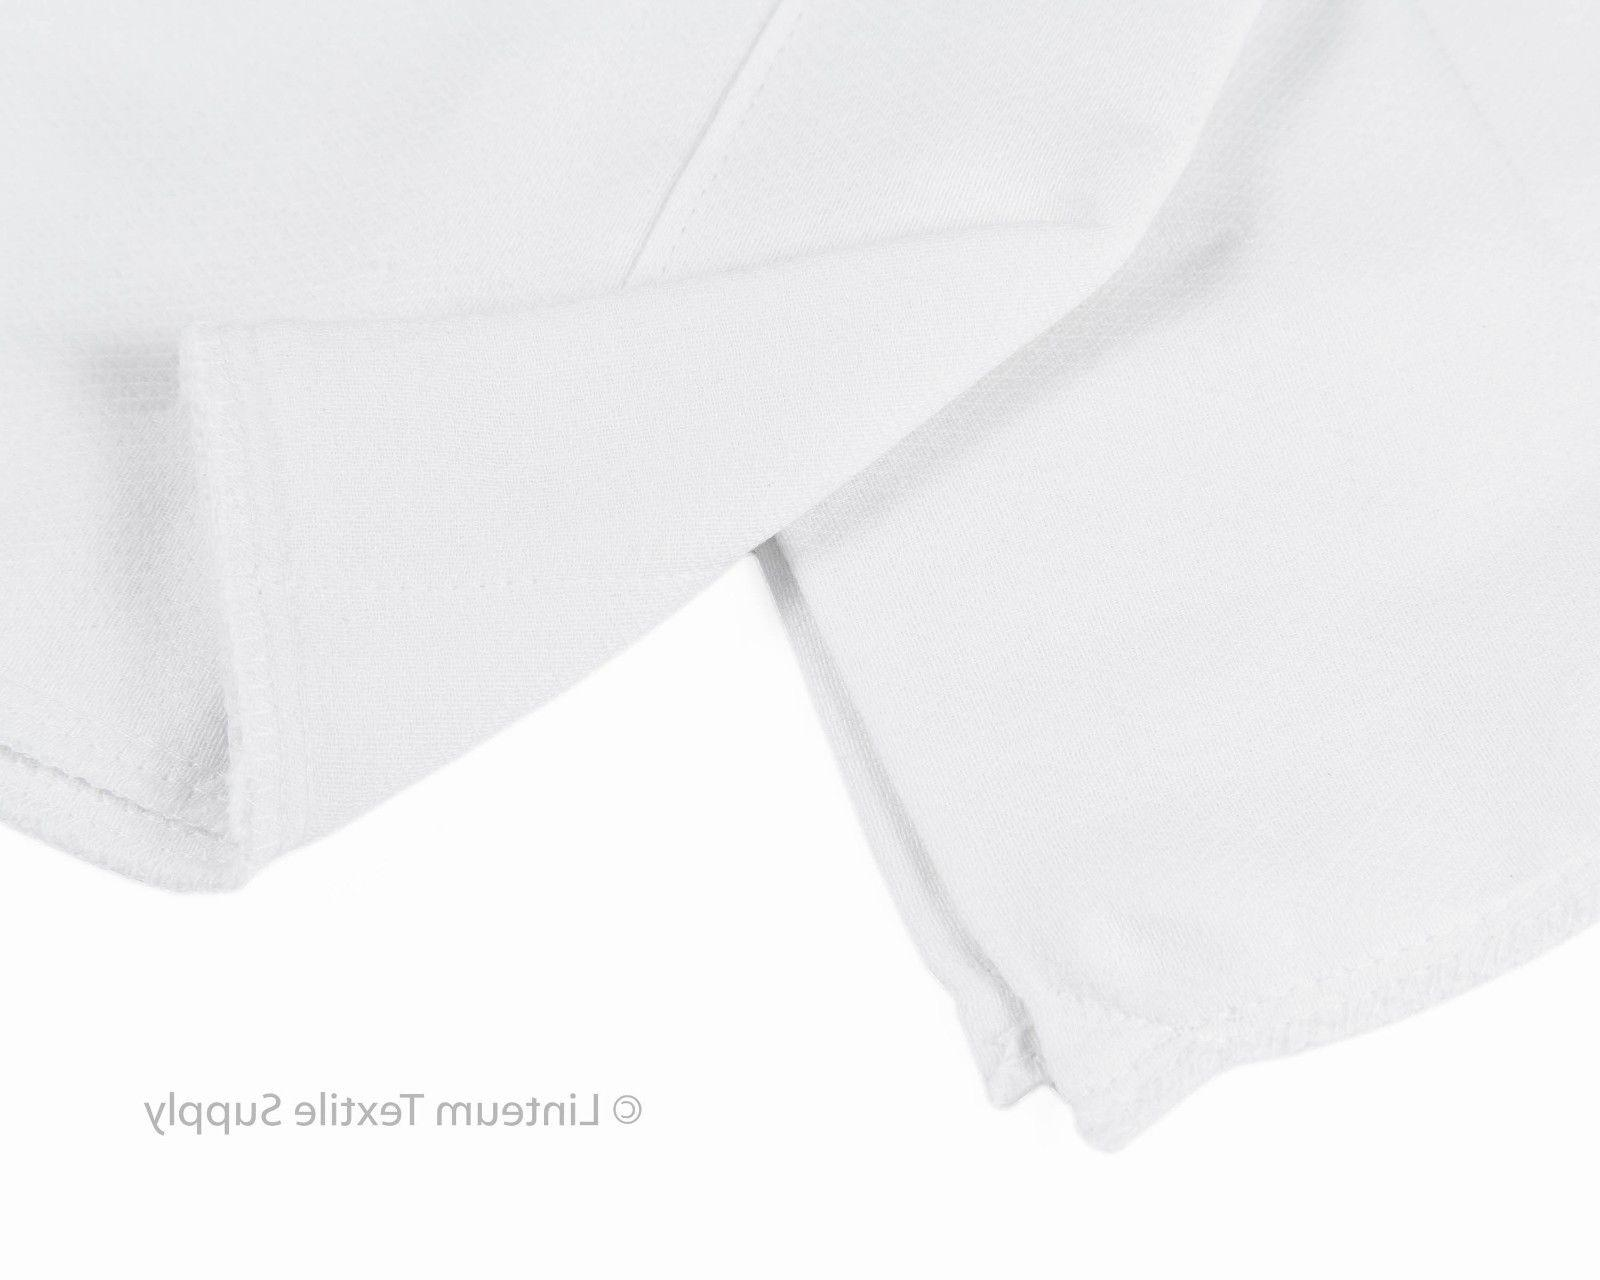 Linteum BABY DIAPERS Reusable Birdseye Cloth